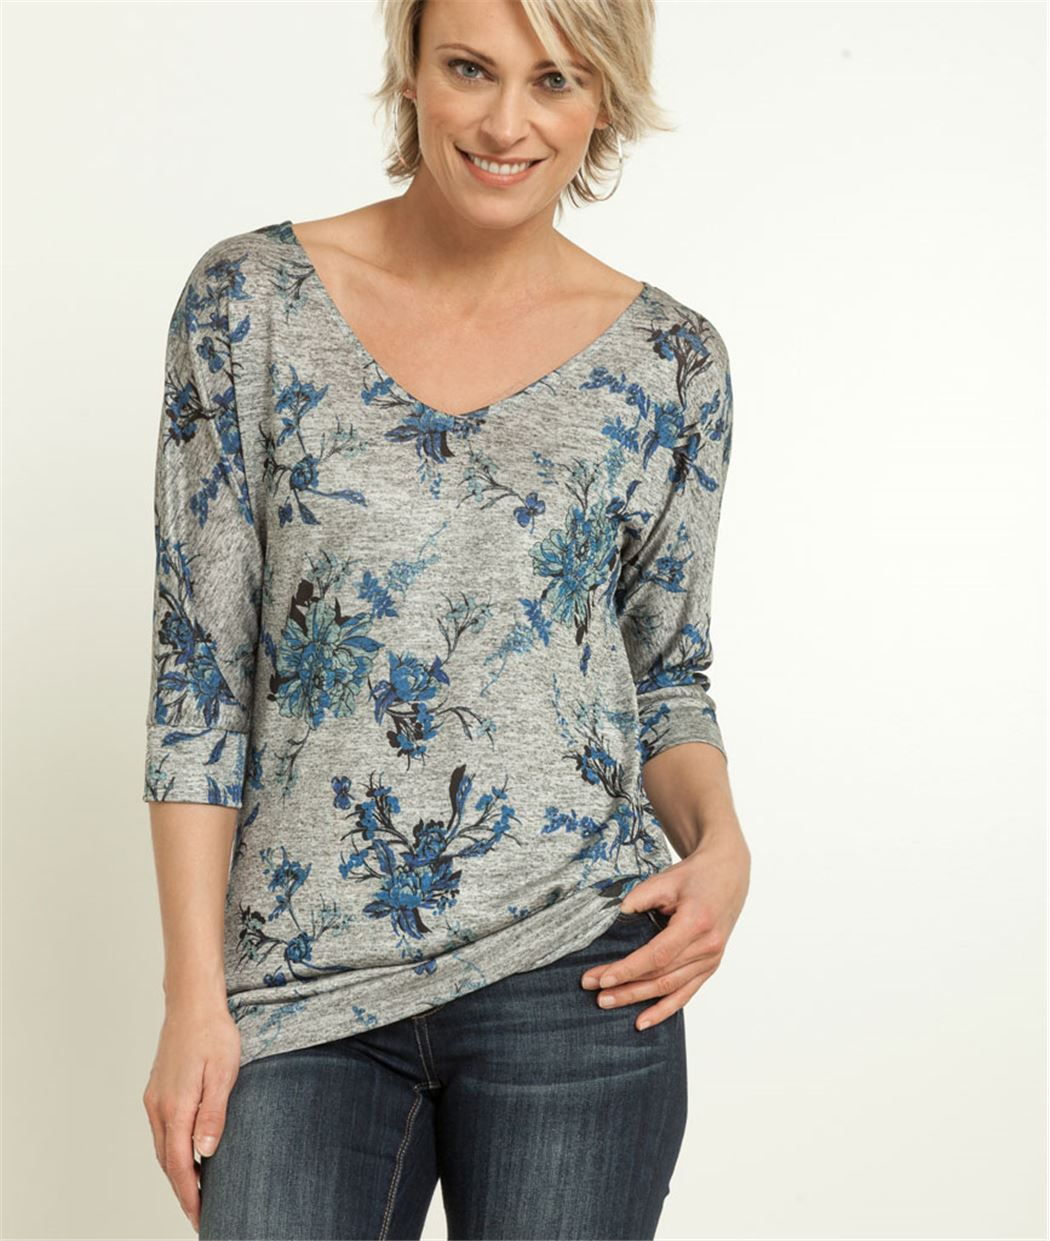 Tshirt femme imprimés fleurs GRIS MOYEN